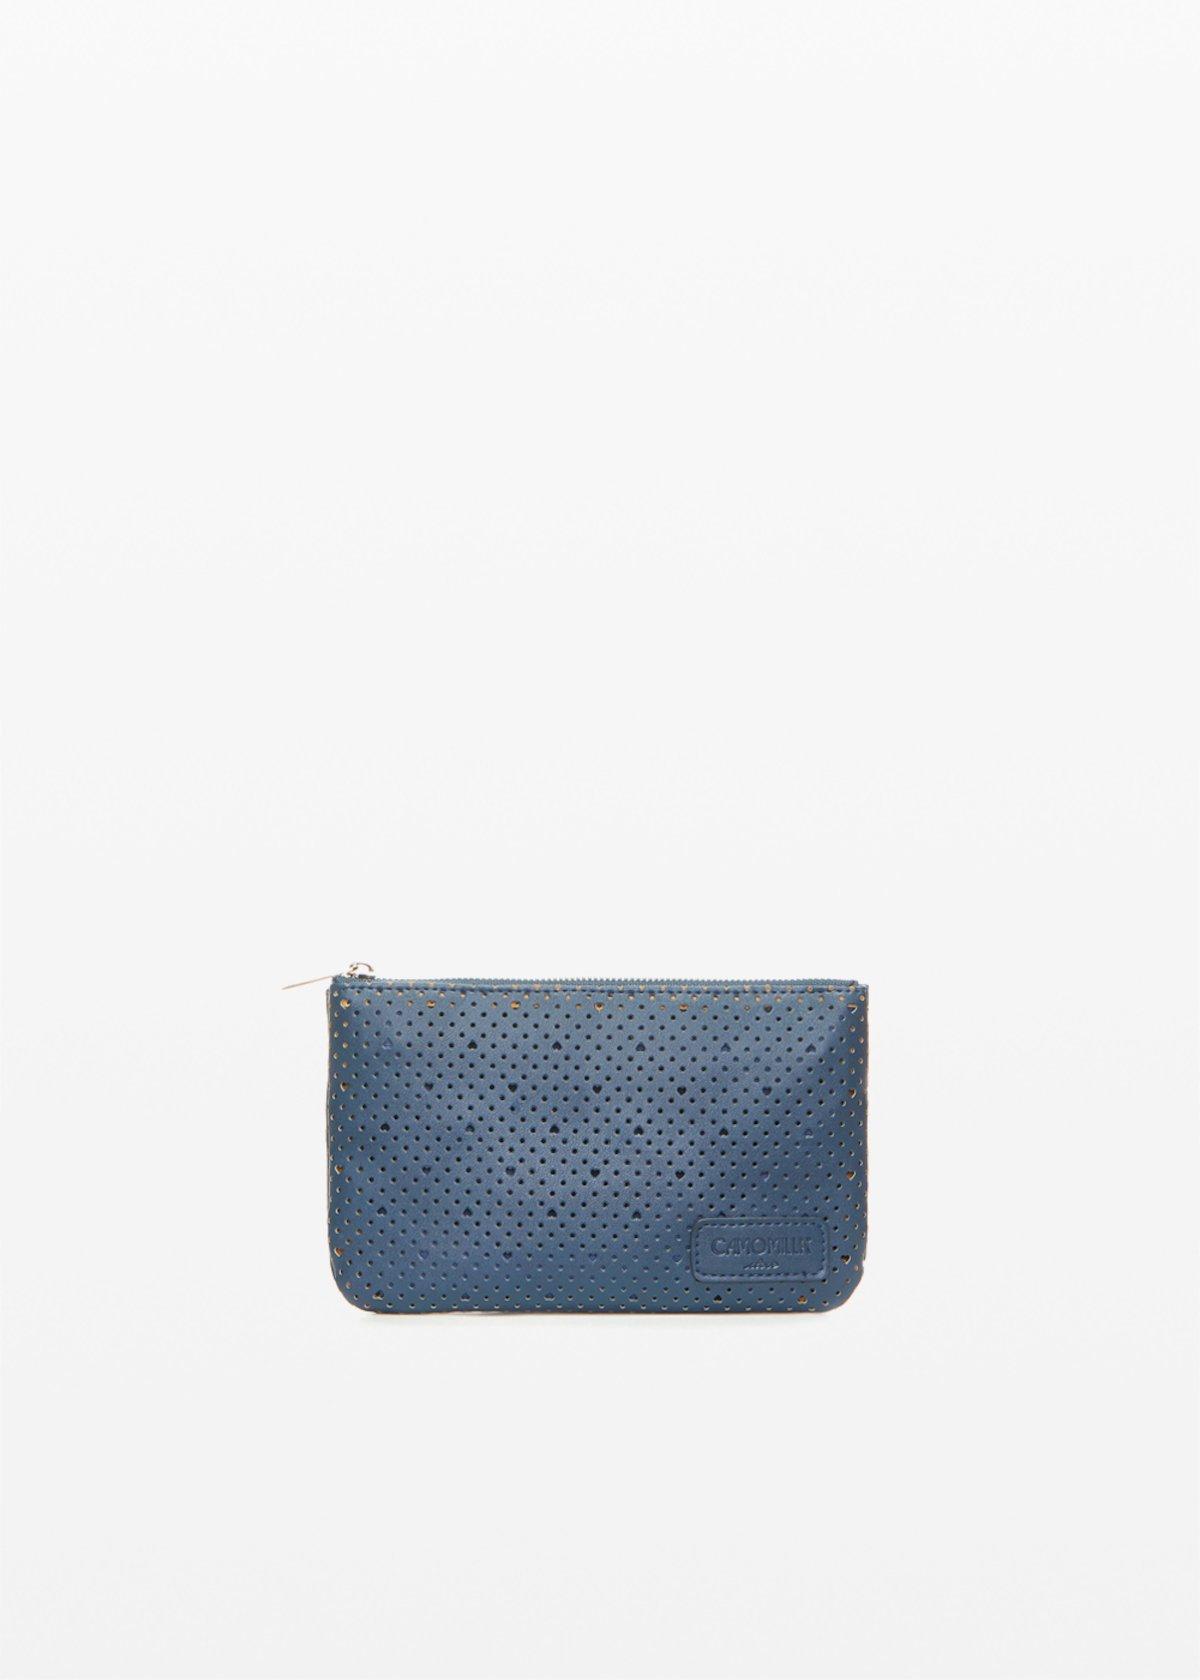 Tongheape Tonga bag with perforated hearts - Medium Blue - Woman - Category image